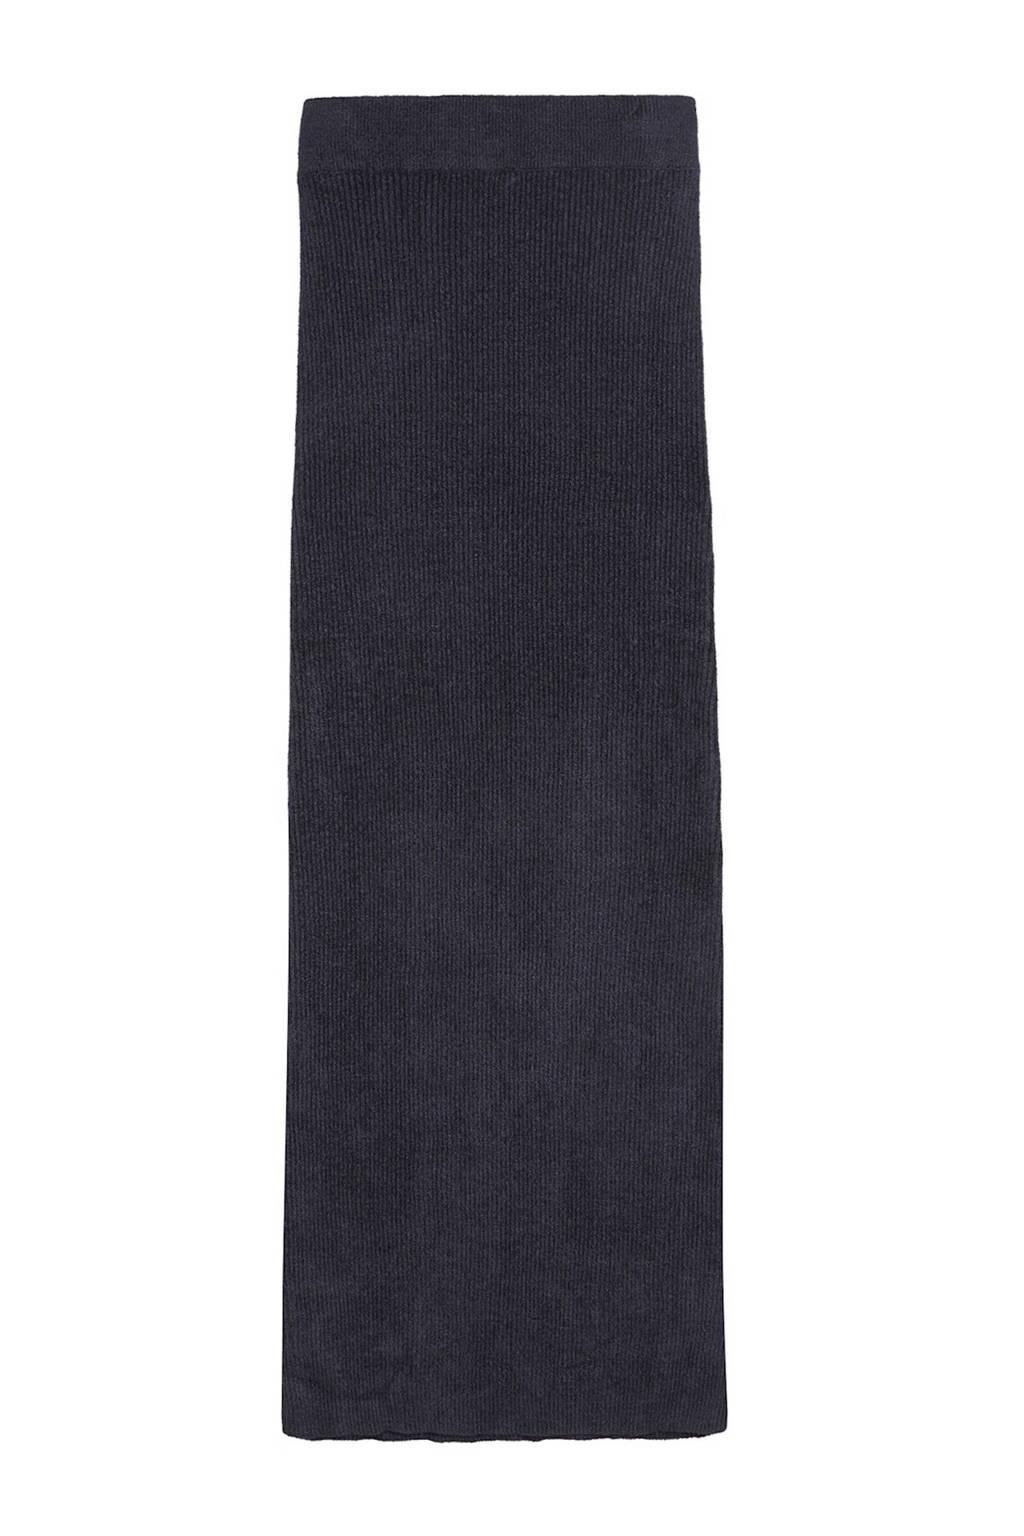 Catwalk Junkie gemêleerde ribgebreide rok Drew donkerblauw, Donkerblauw